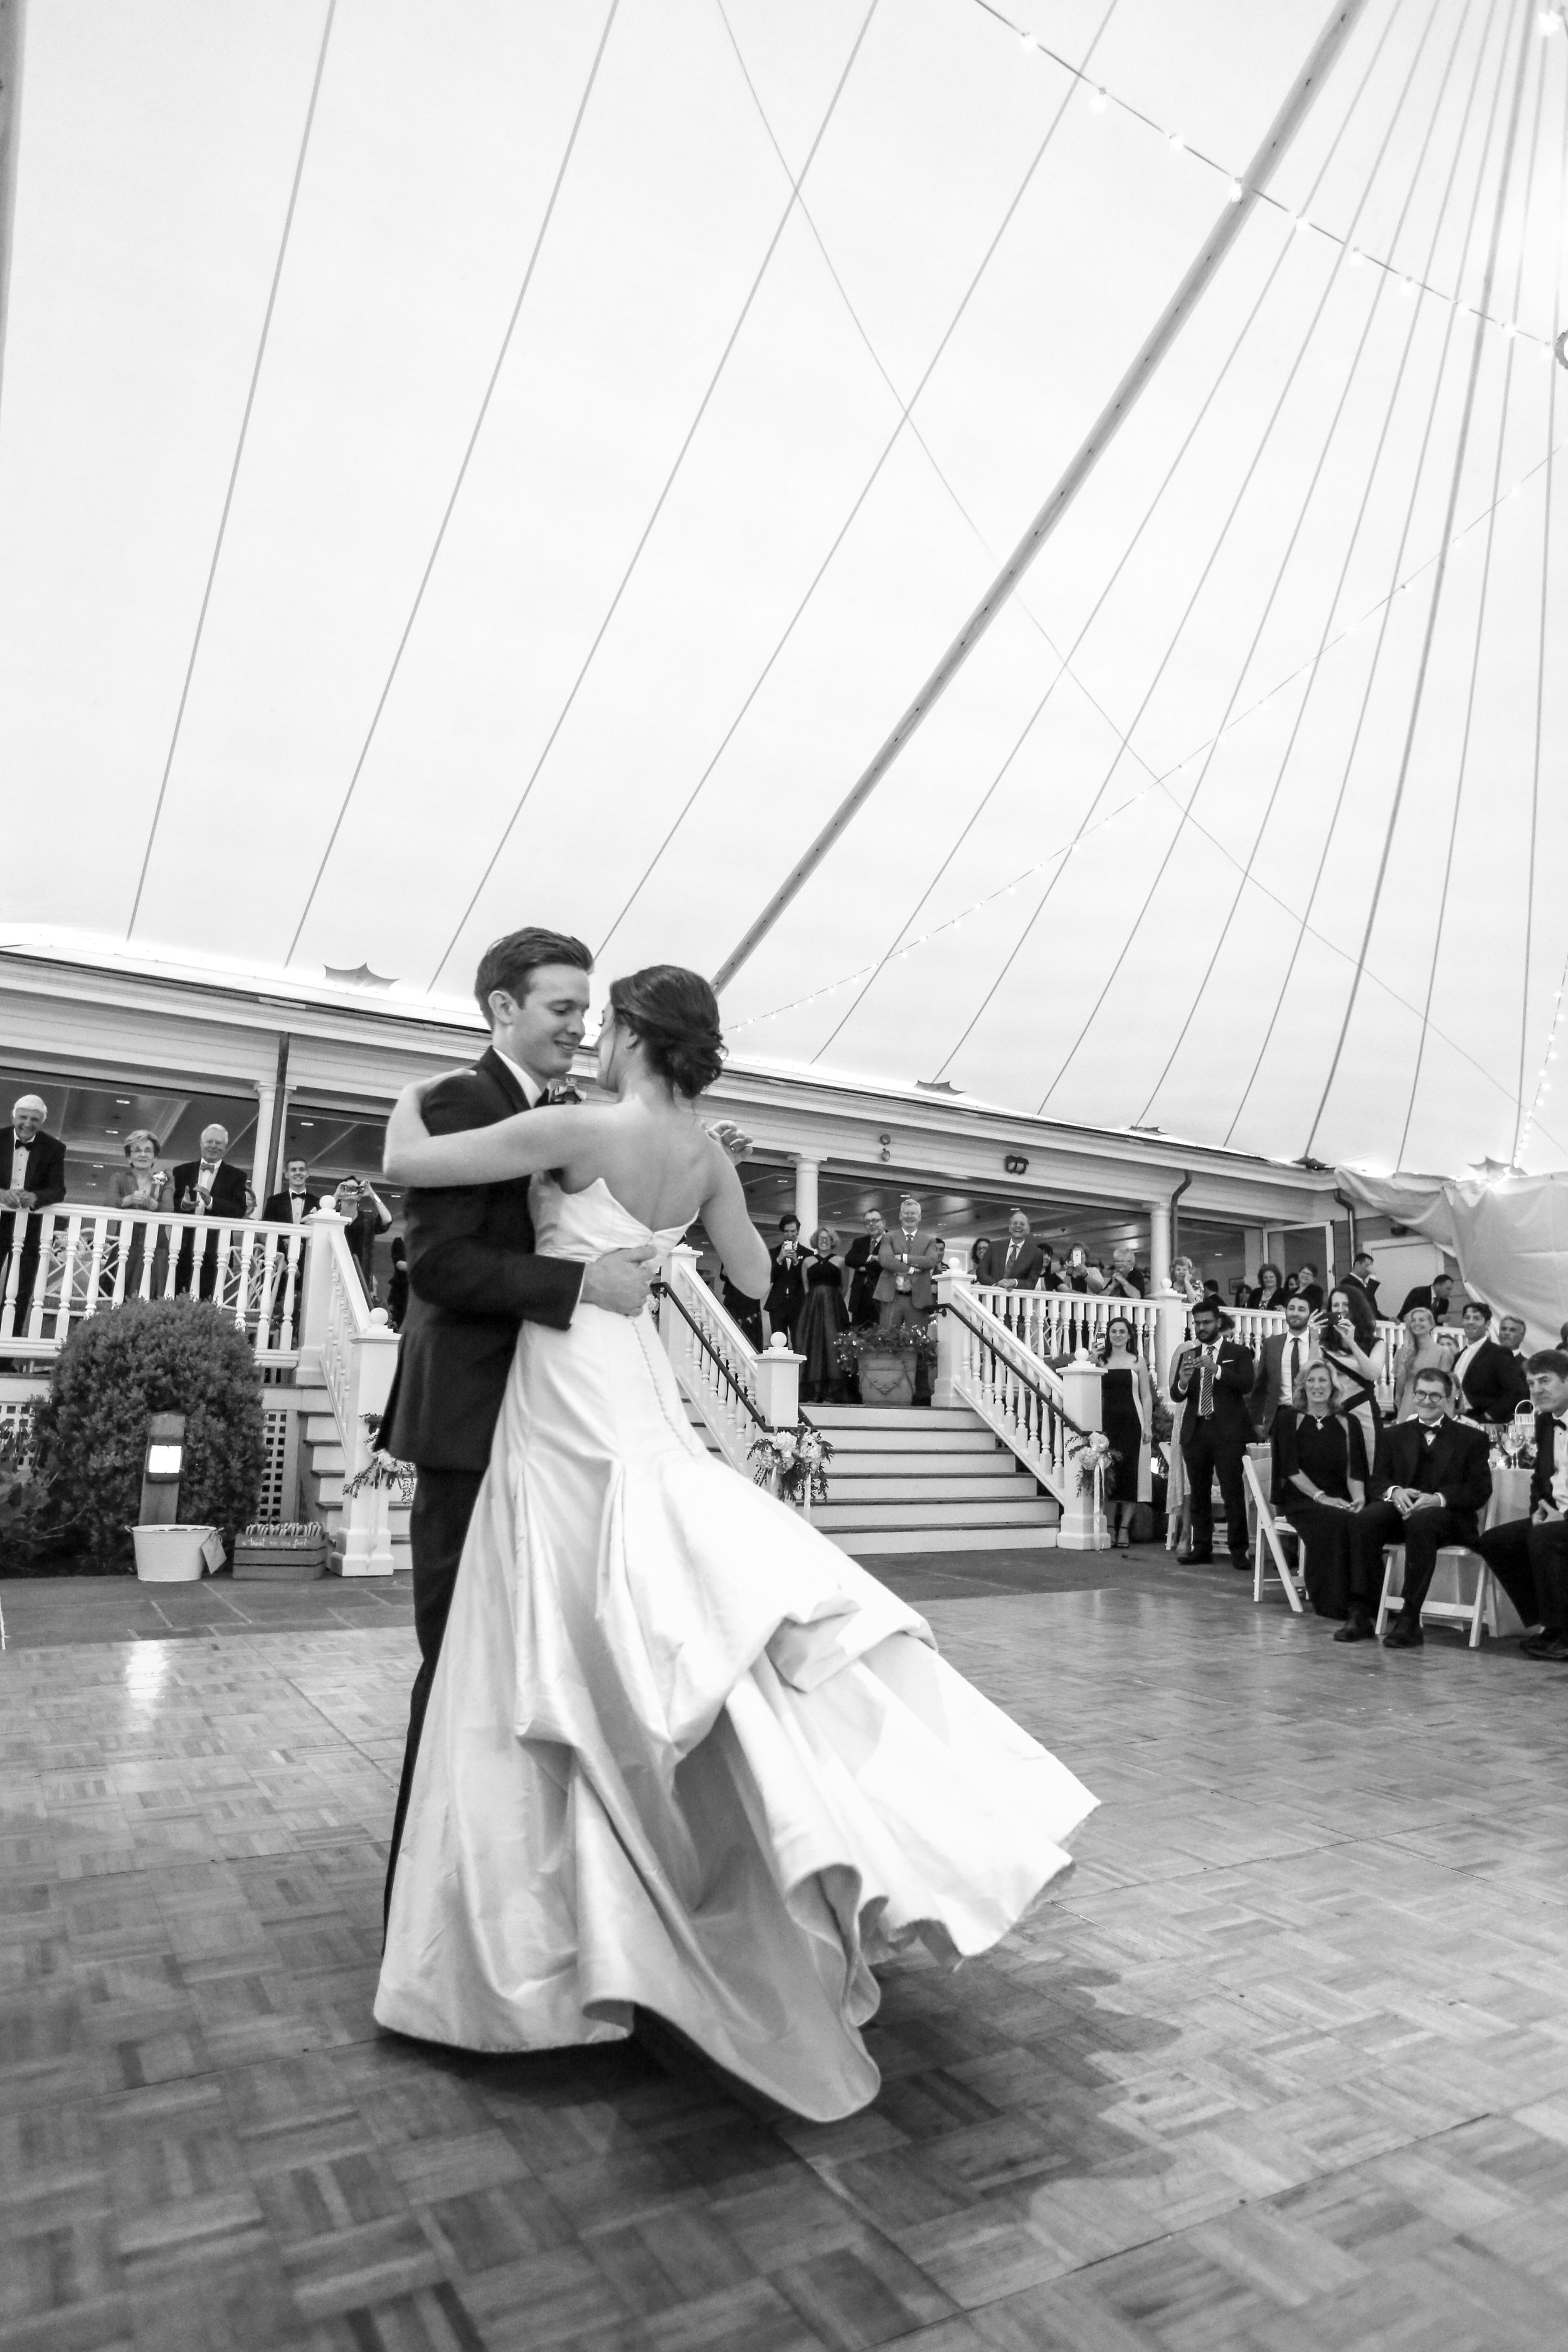 Jeremie_Barlow_Photography_Steffen_Sudyam_wedding_2018-862.jpg